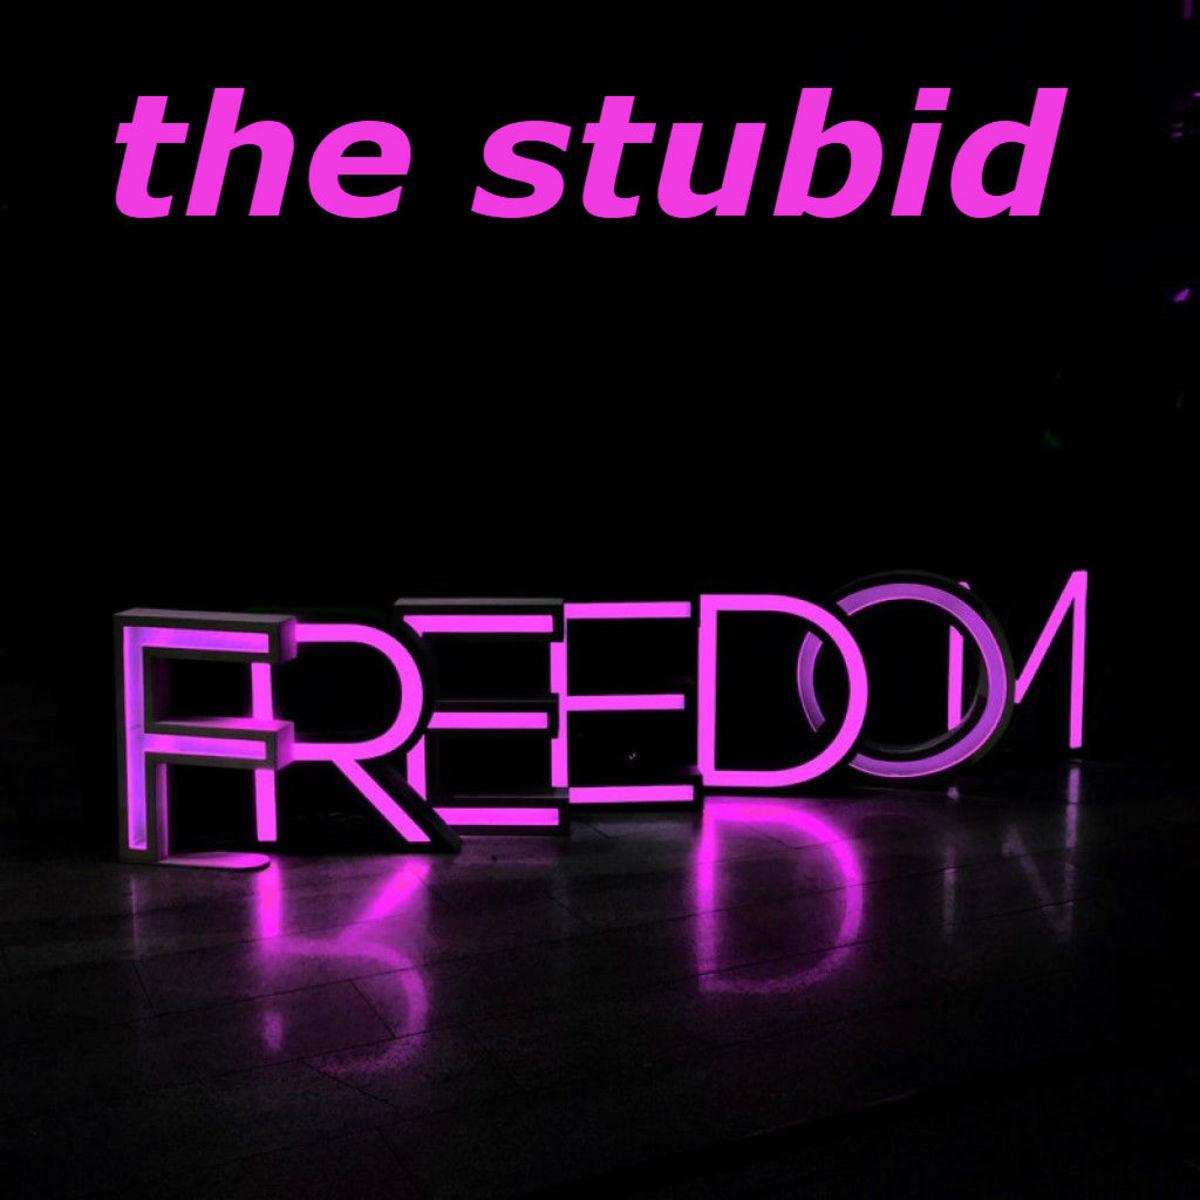 The Stupid Freedom ...